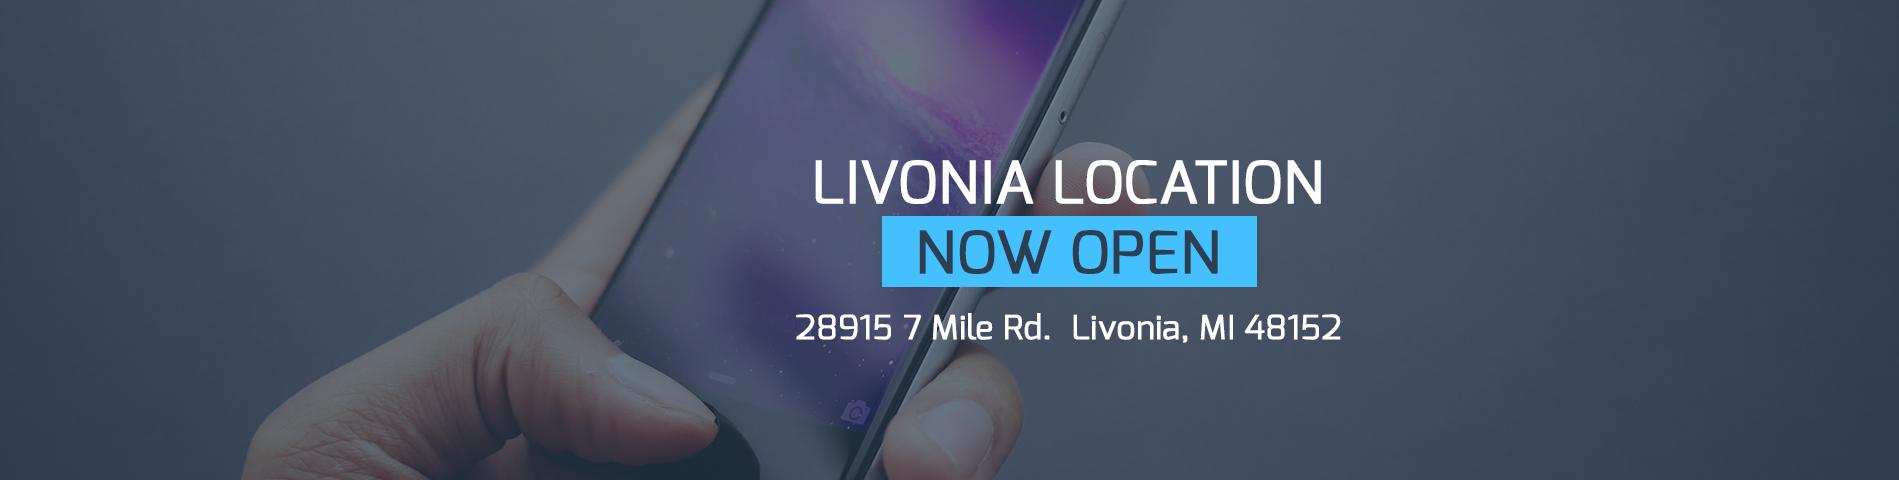 MDPR-Livonia-opening-banner